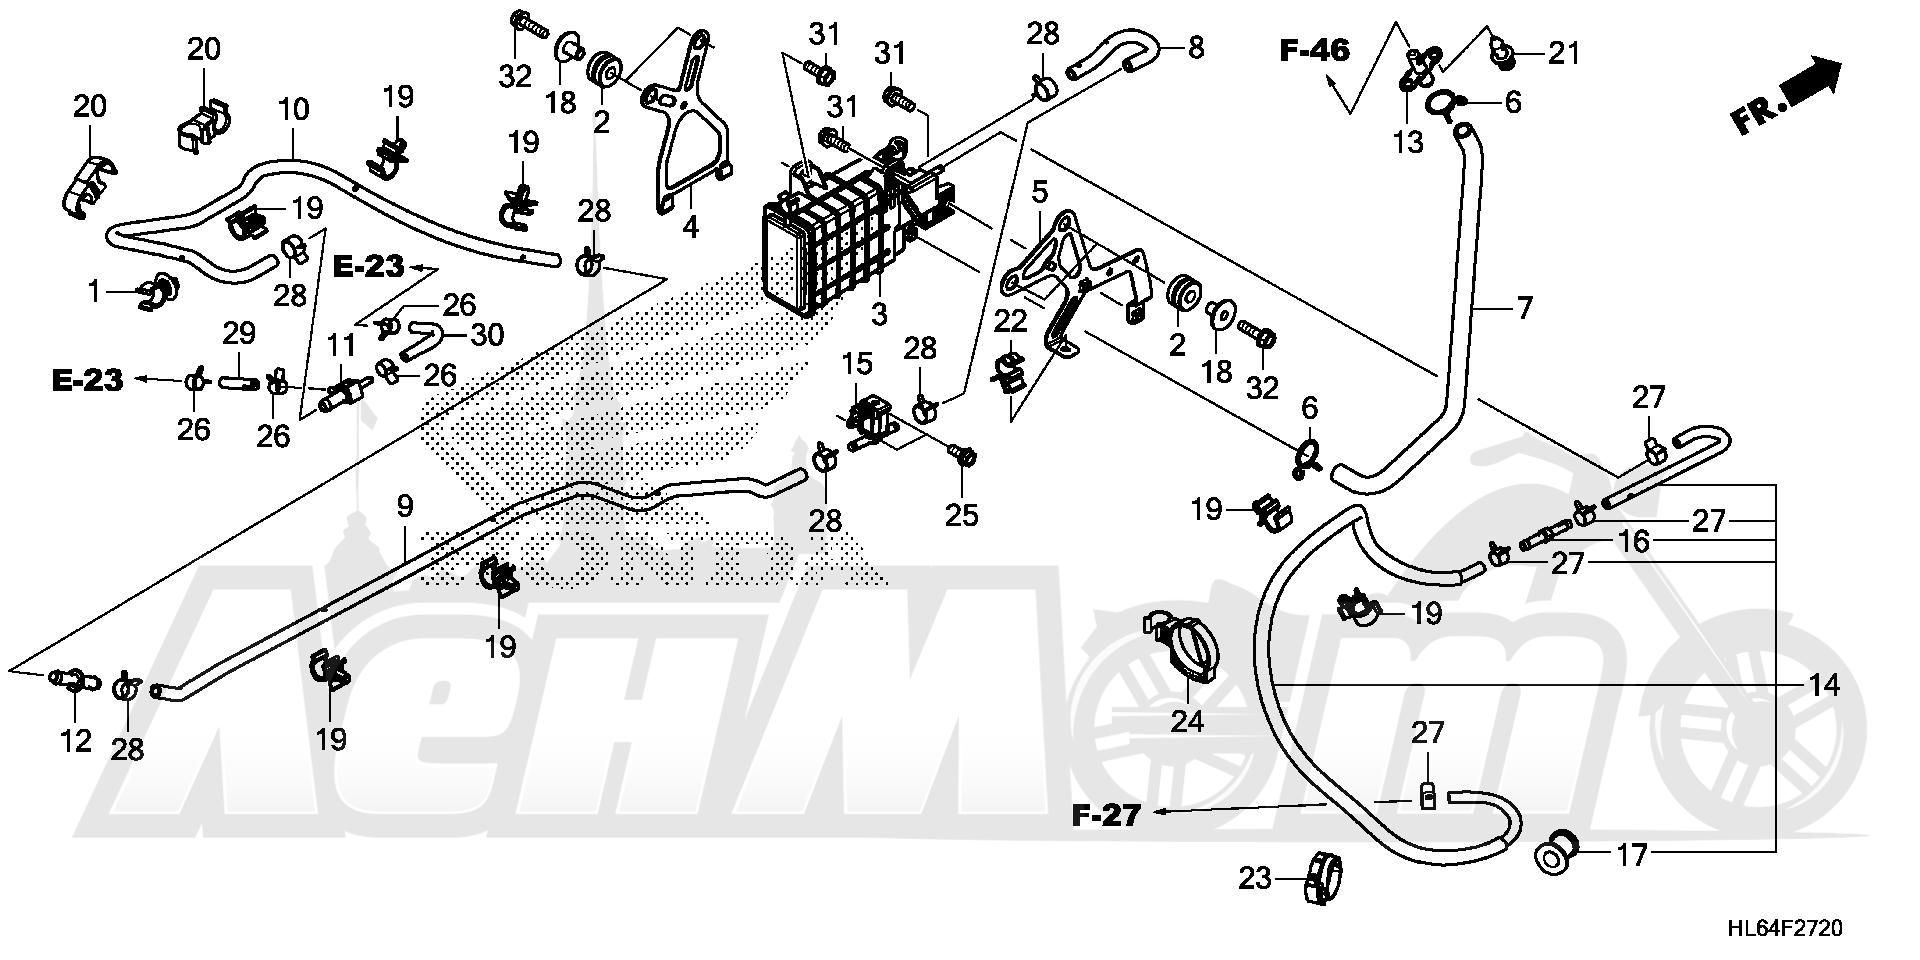 Запчасти для Квадроцикла Honda 2019 SXS1000S2X Раздел: EVAP CANISTER   EVAP канистра